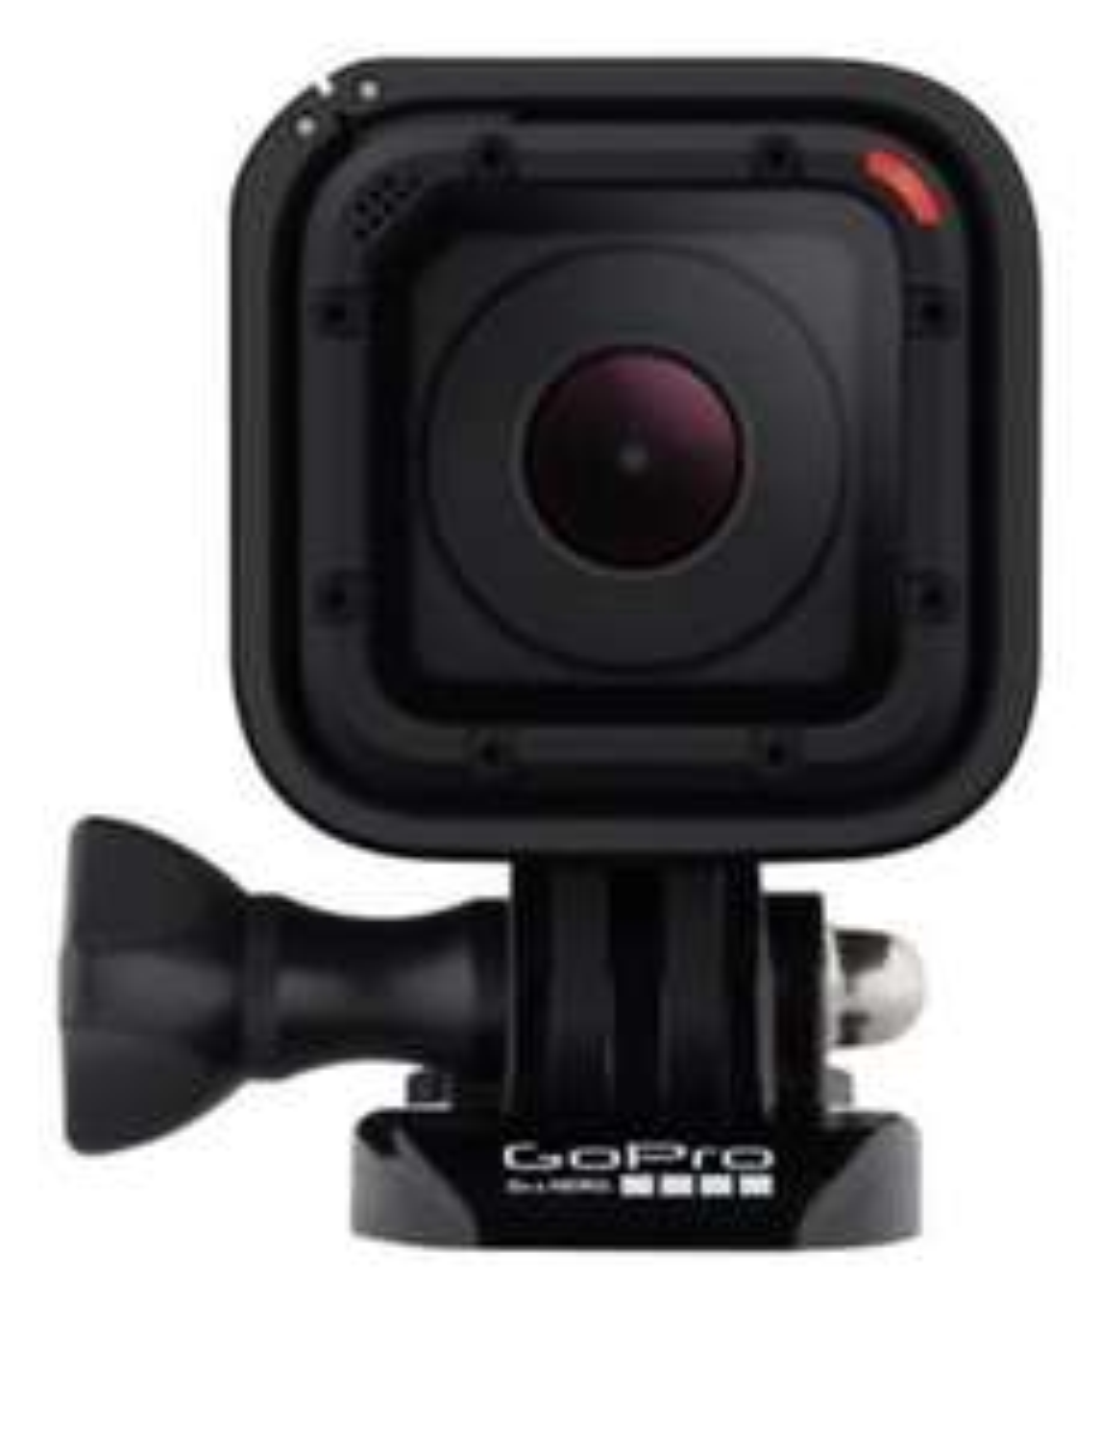 GoPro HERO Session Action Camera Camcorder - Certified Refurbished £87.98 @  gopro_certified_uk Ebay